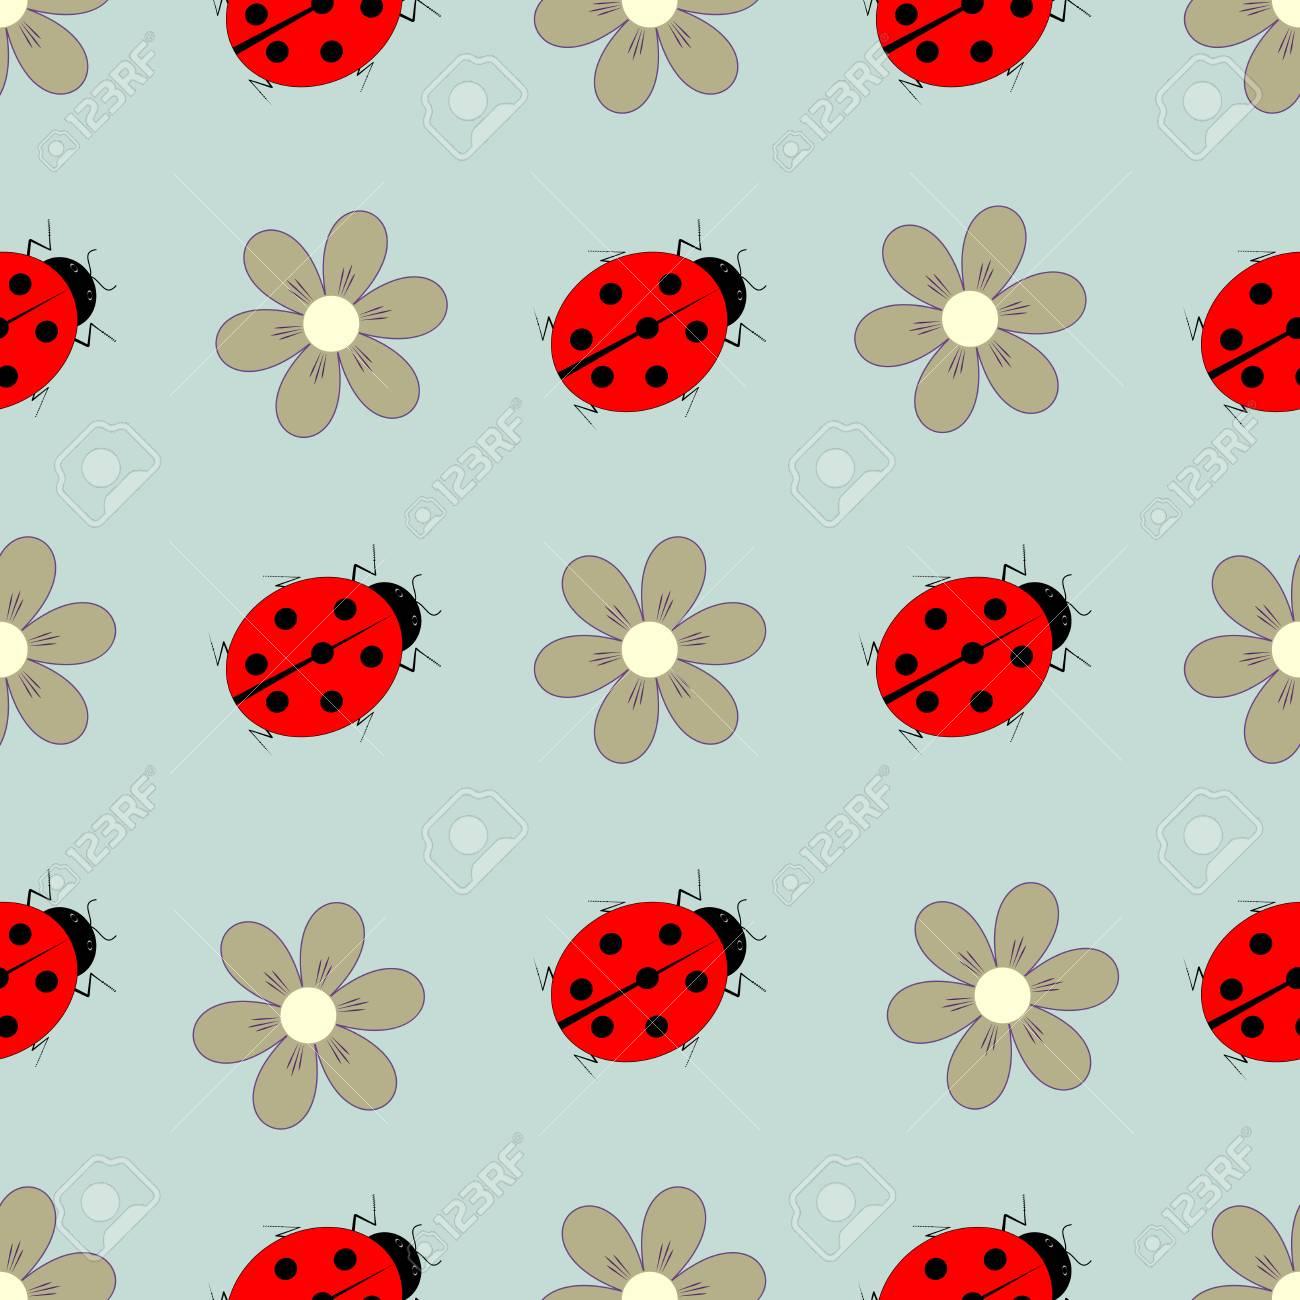 ladybug and flower seamless pattern fashion graphic background